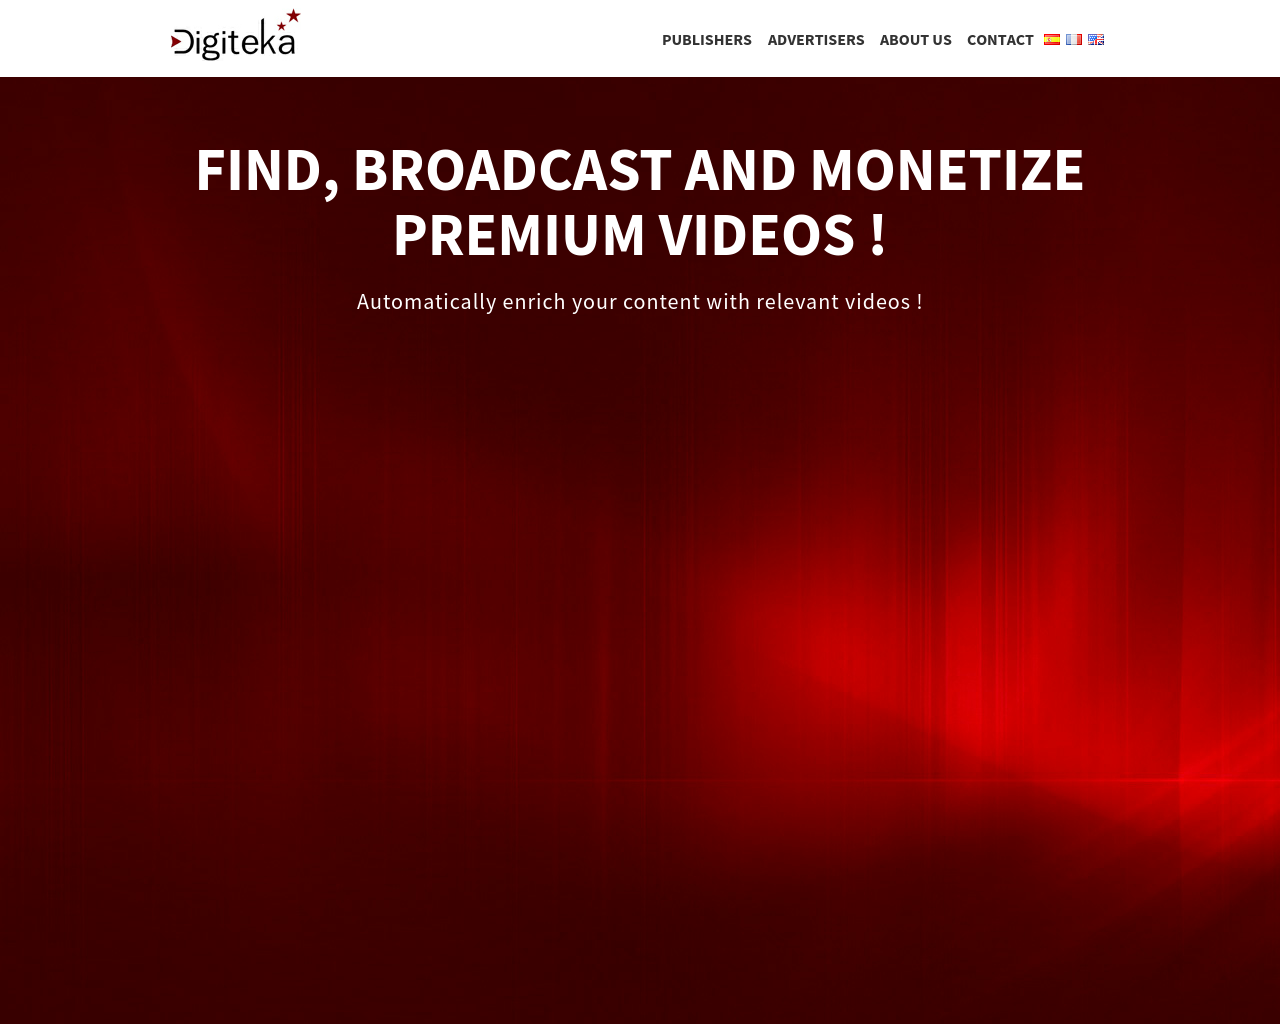 Digiteka-Advertising-Reviews-Pricing